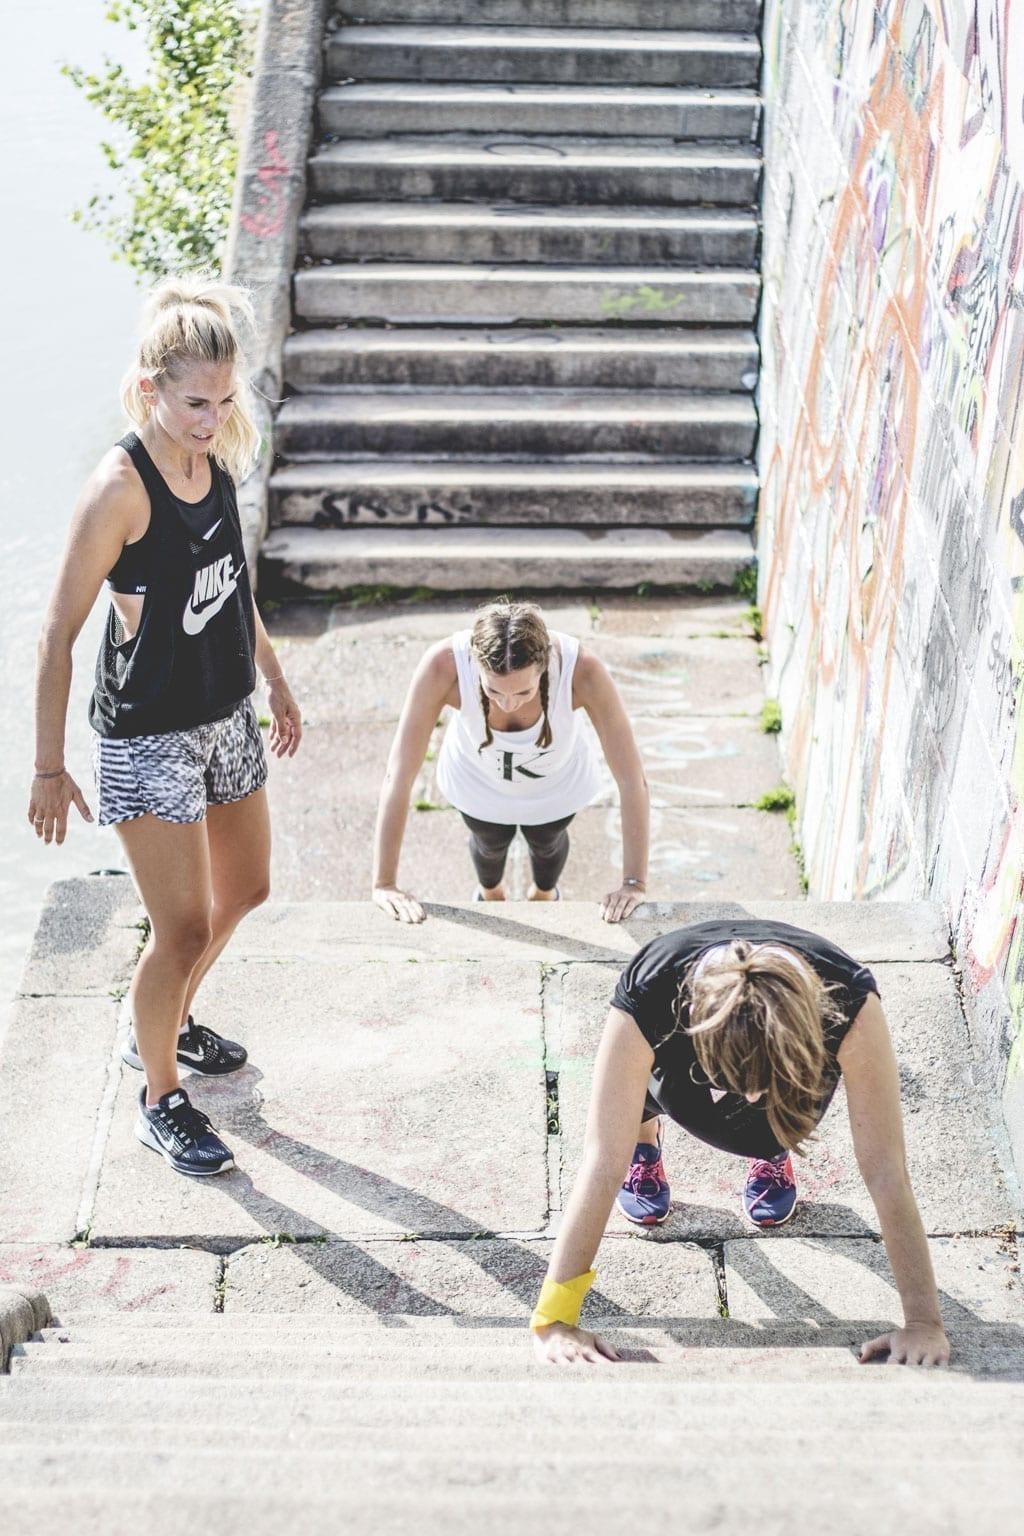 CK-1606-constantly-k-karin-kaswurm-daily-dose-fashion-lifestyle-blog-vicky-heiler-kathi-schmalzl-workout-60